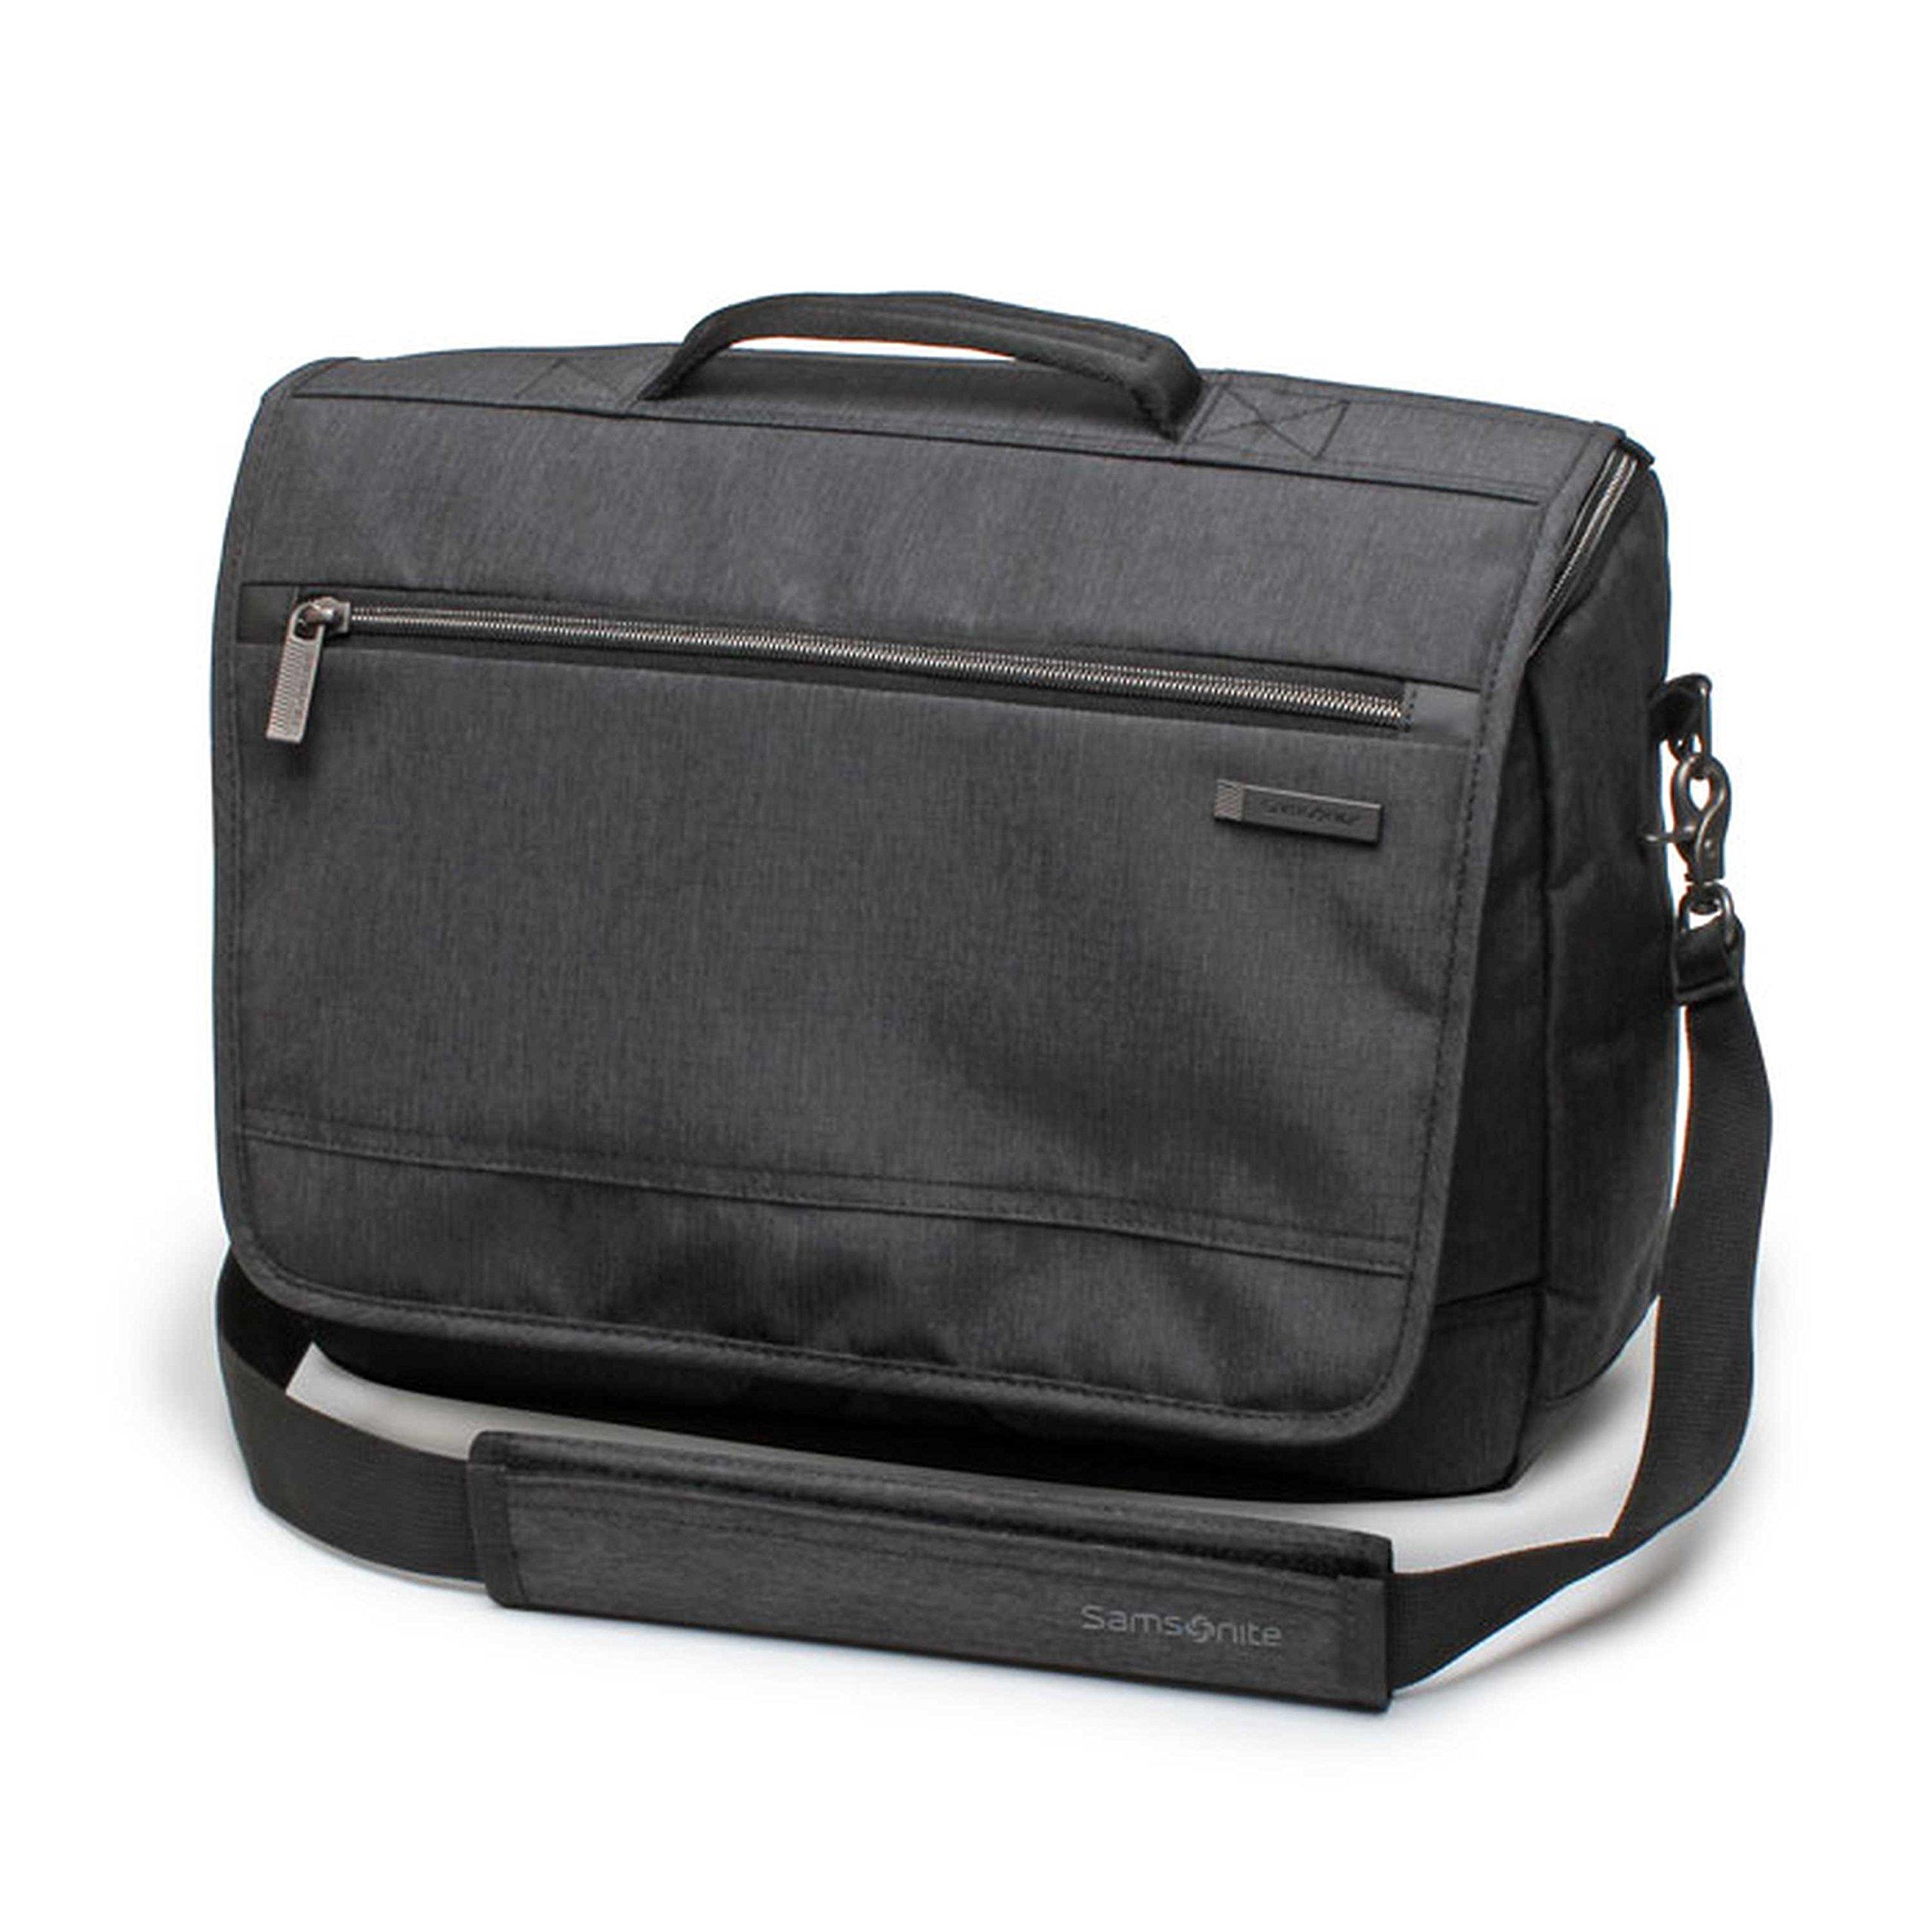 Samsonite Modern Utility Messenger Bag Laptop, Charcoal Heather, One Size